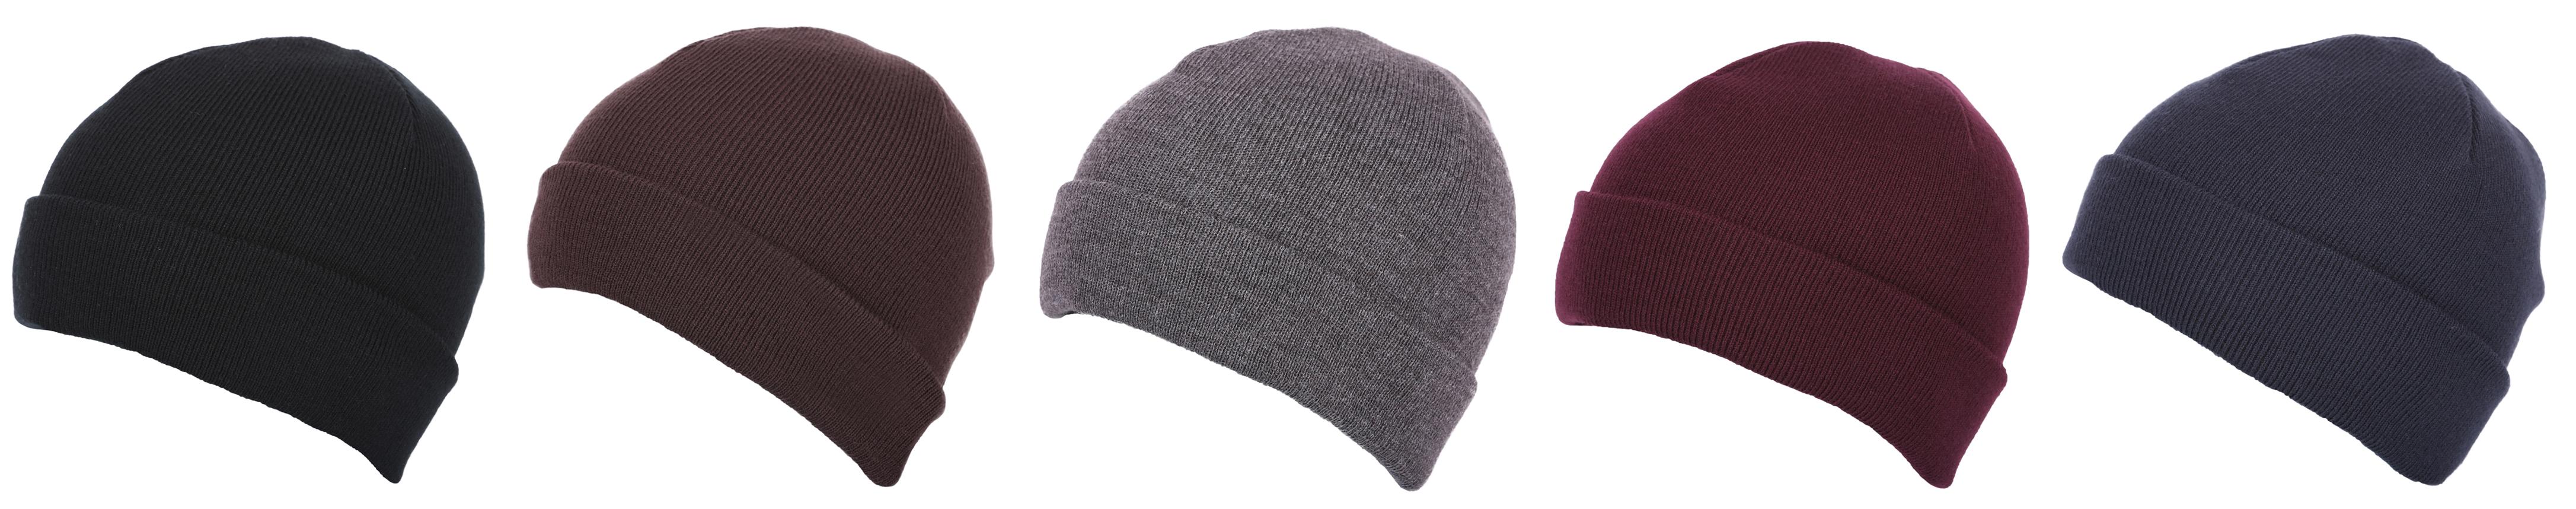 Classic47 Knit Beanie (Top 5 AW Headwear)